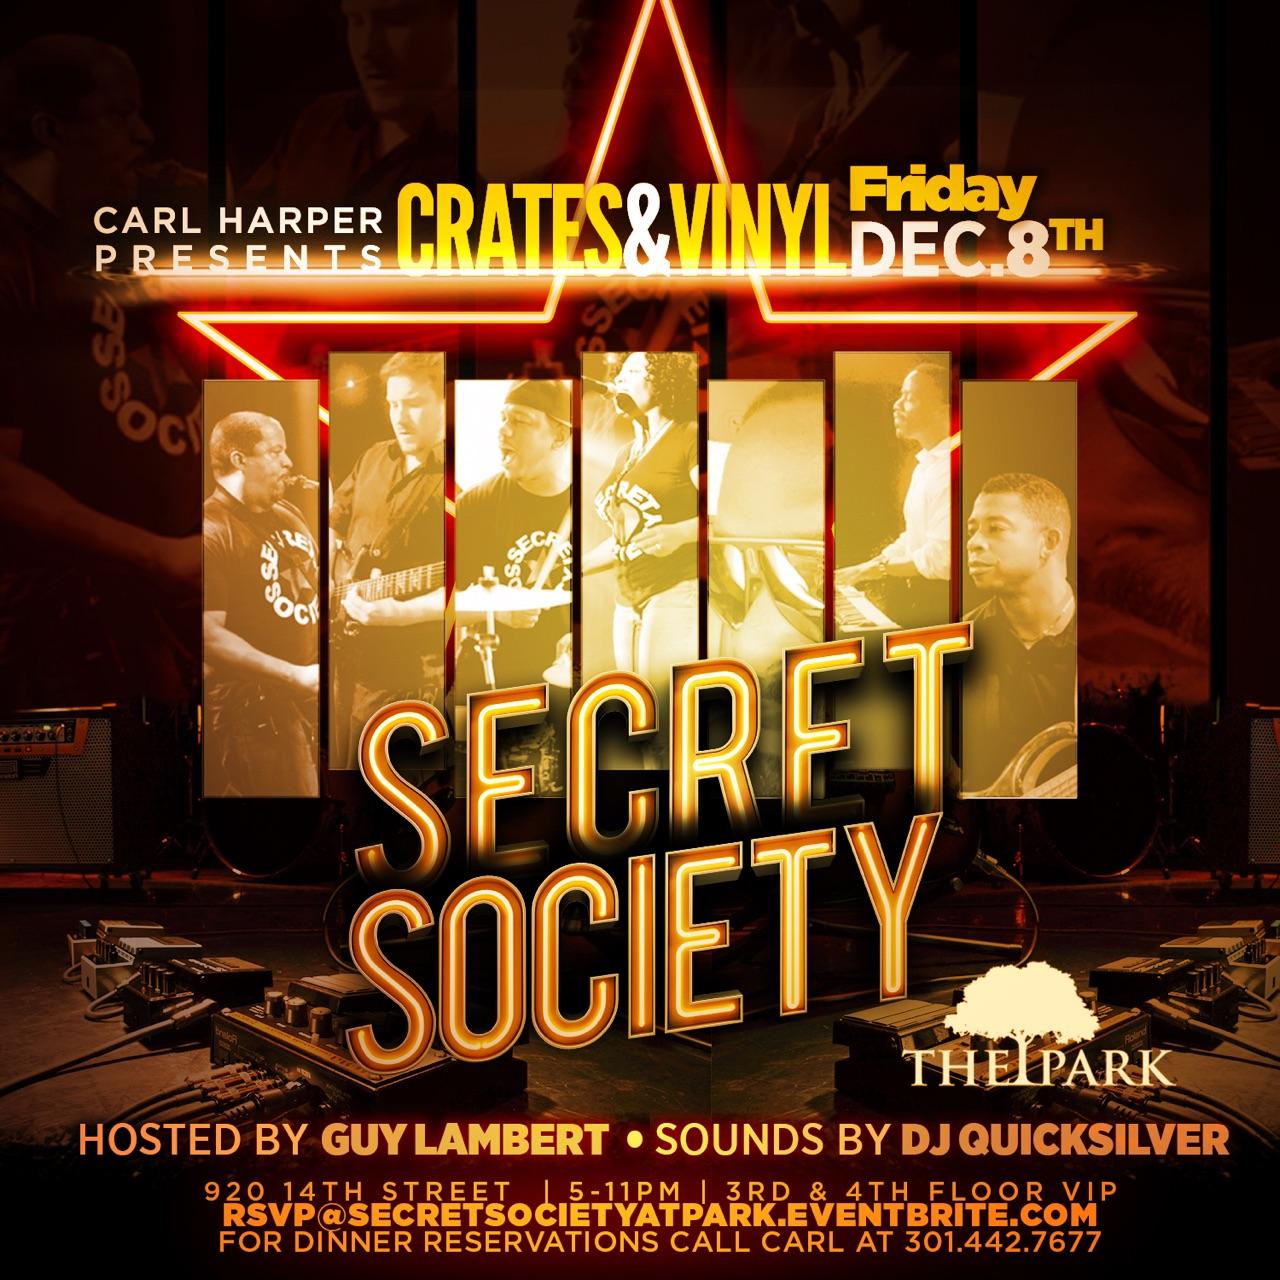 SecretSociety2.jpg.jpeg